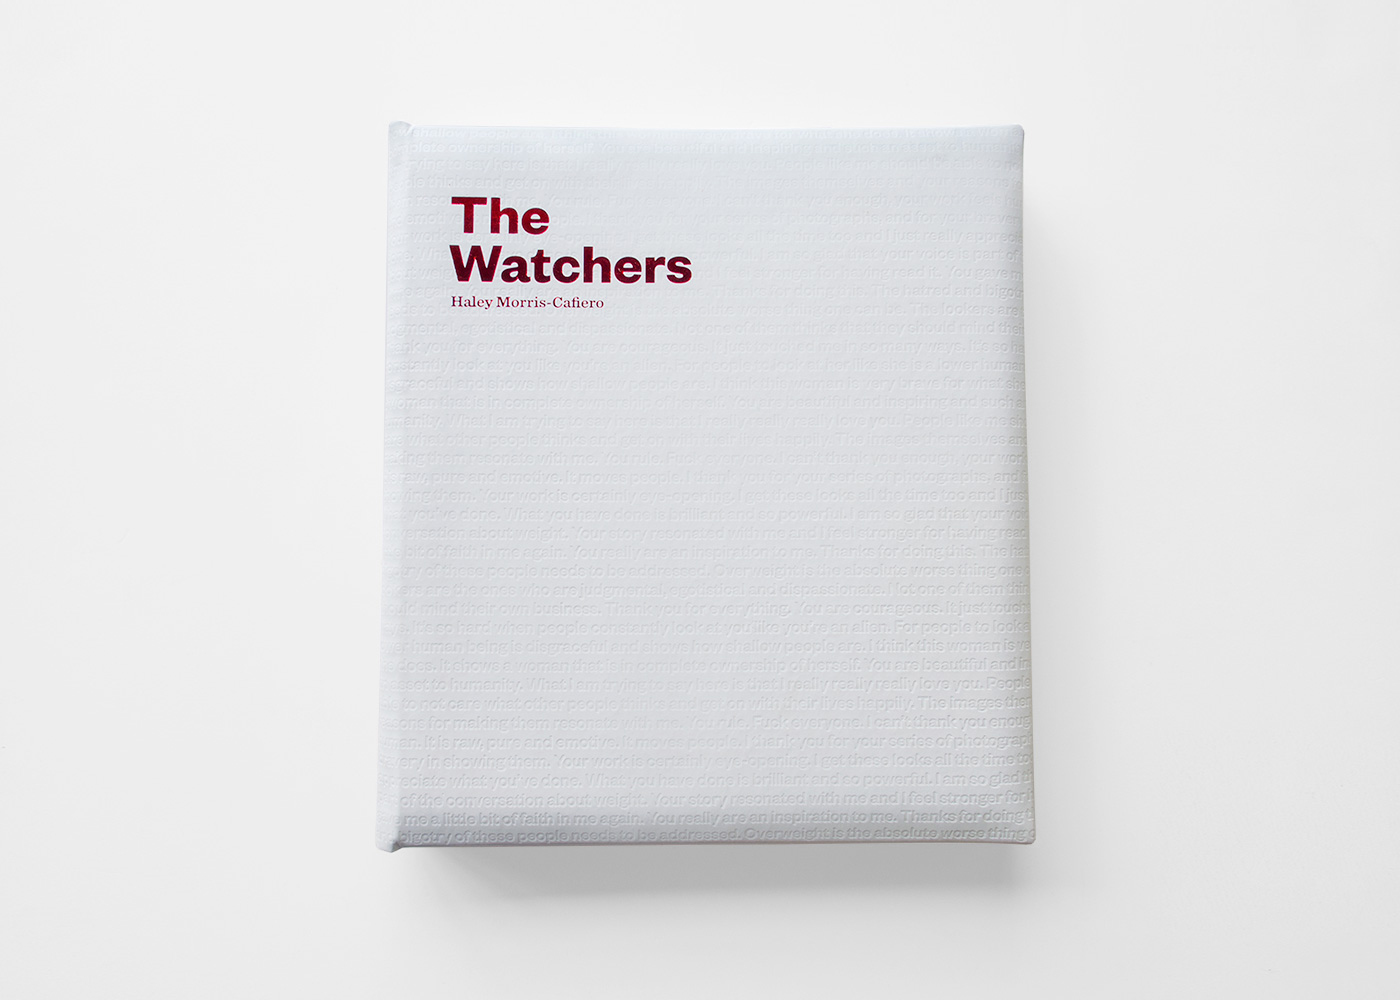 The Watchers by Haley Morris-Cafiero